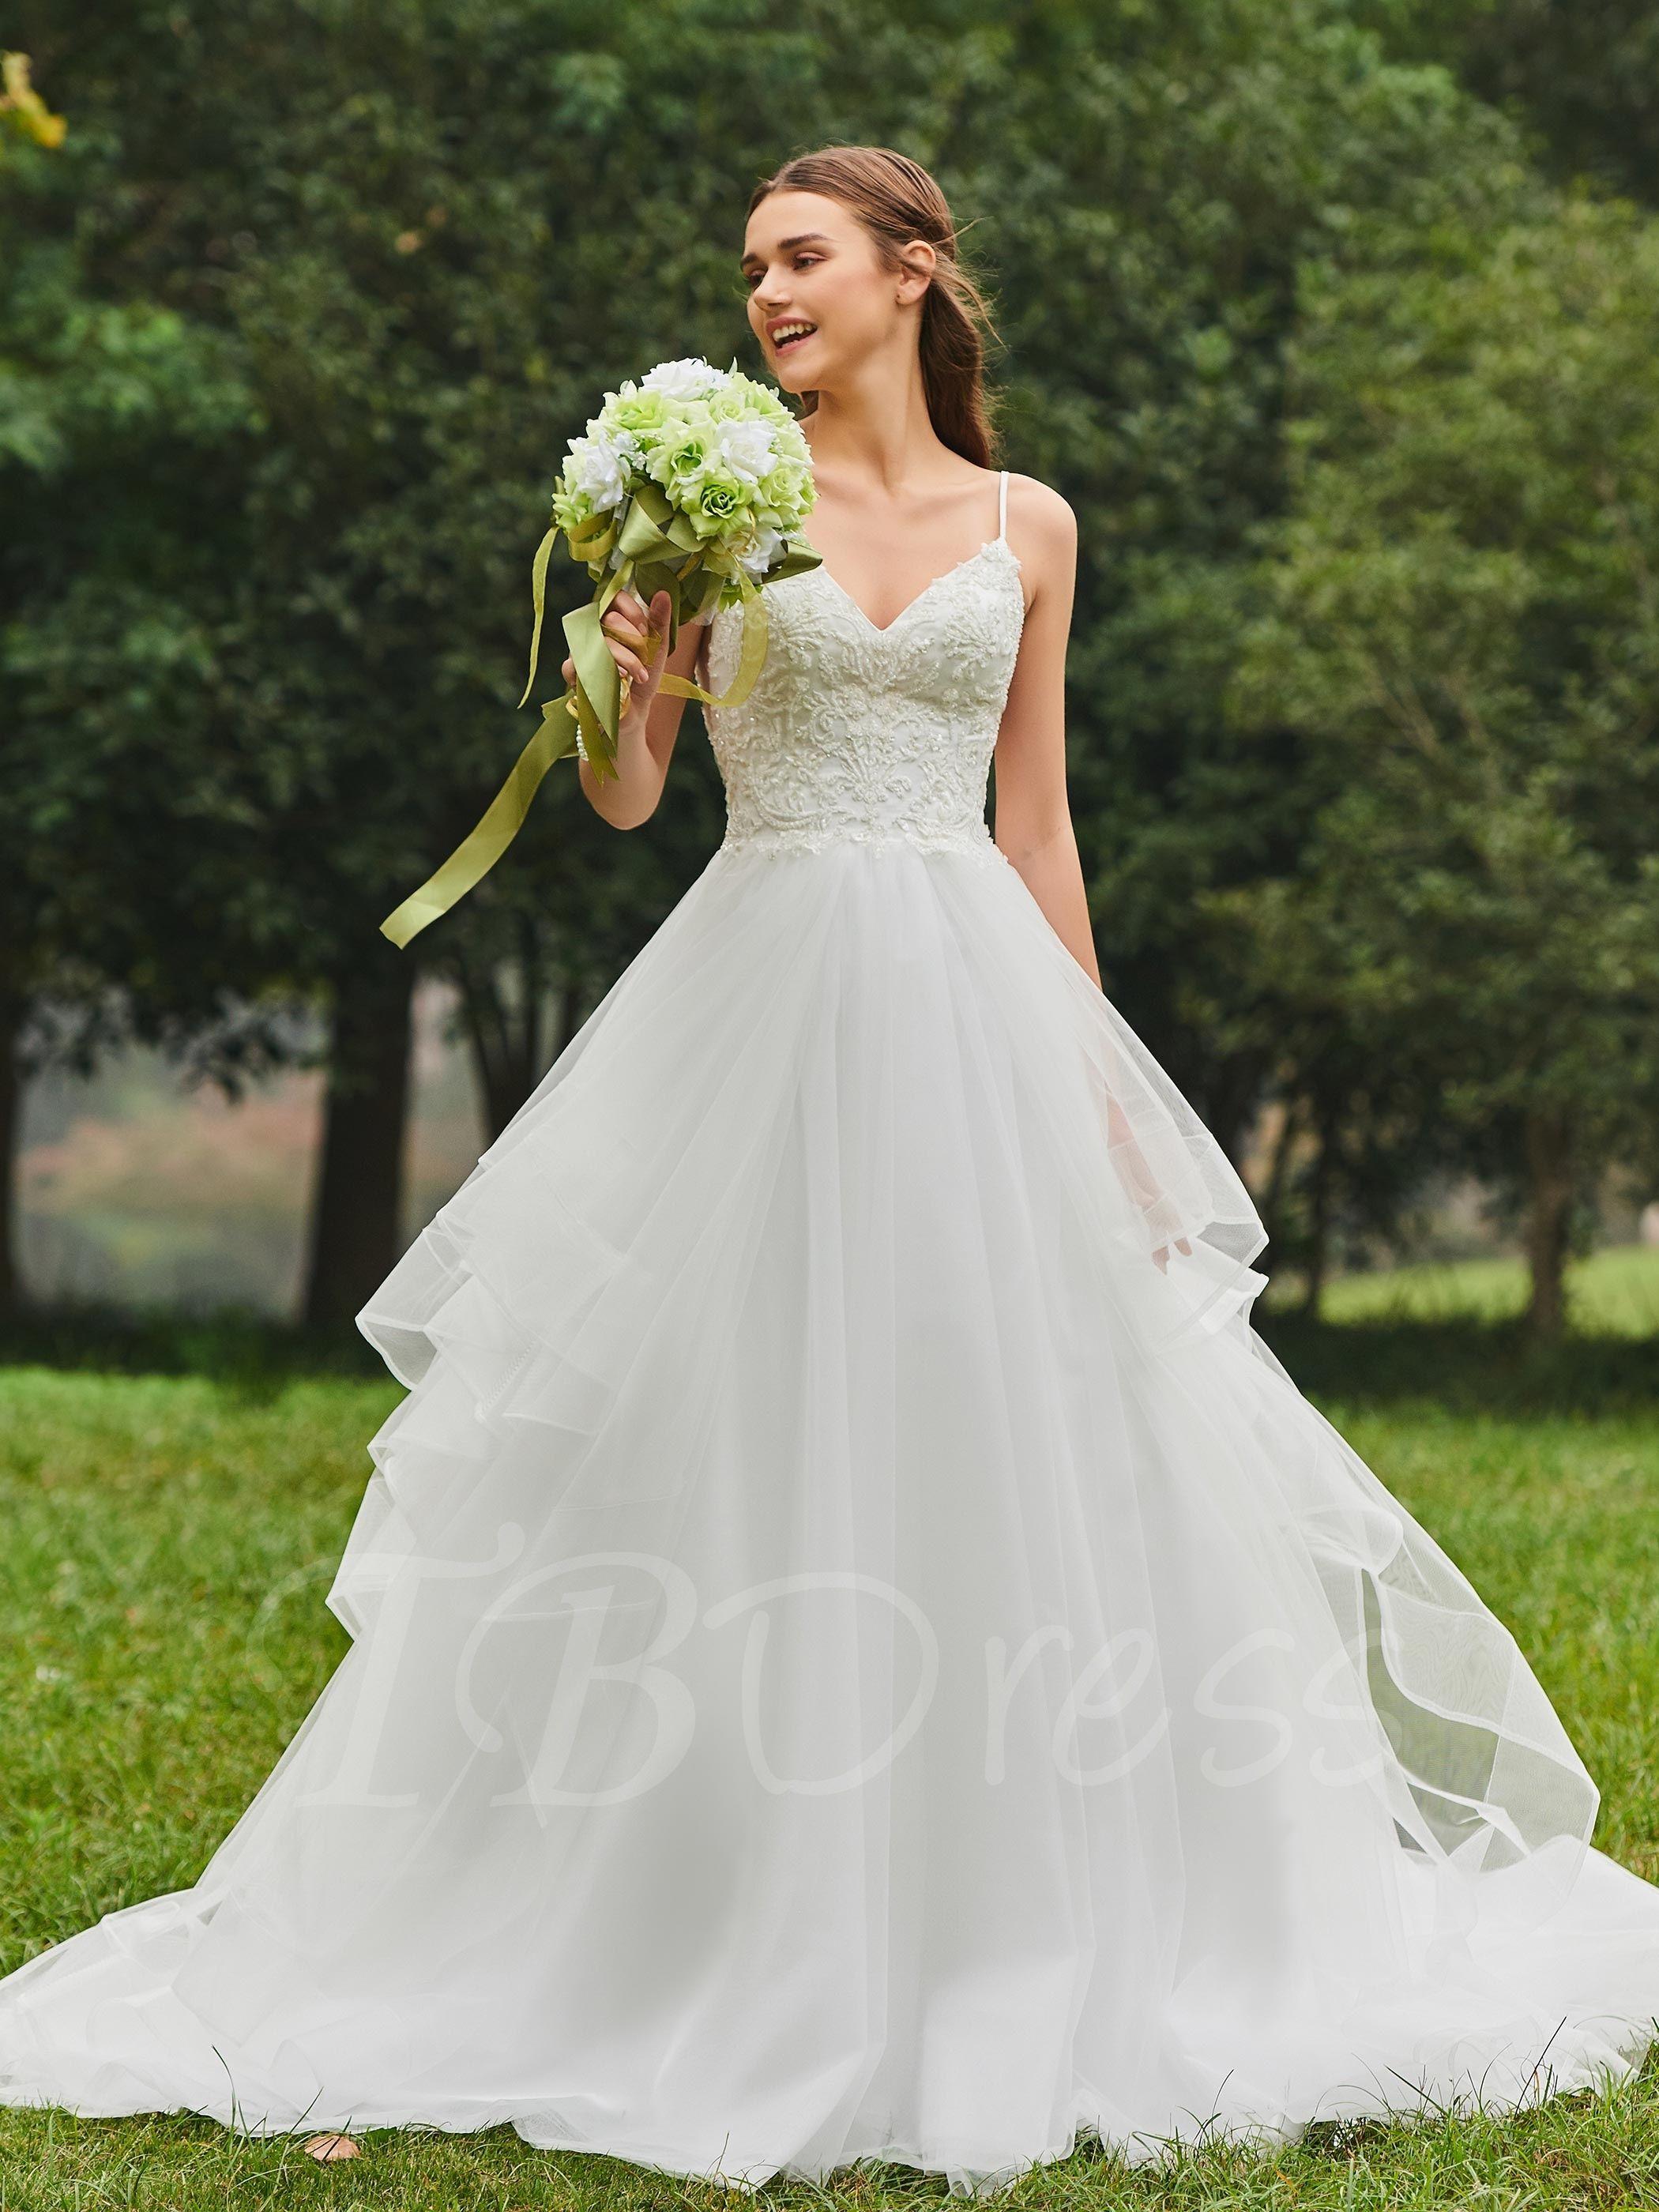 Spaghetti Straps Beaded Appliques Wedding Dress | Wedding ...